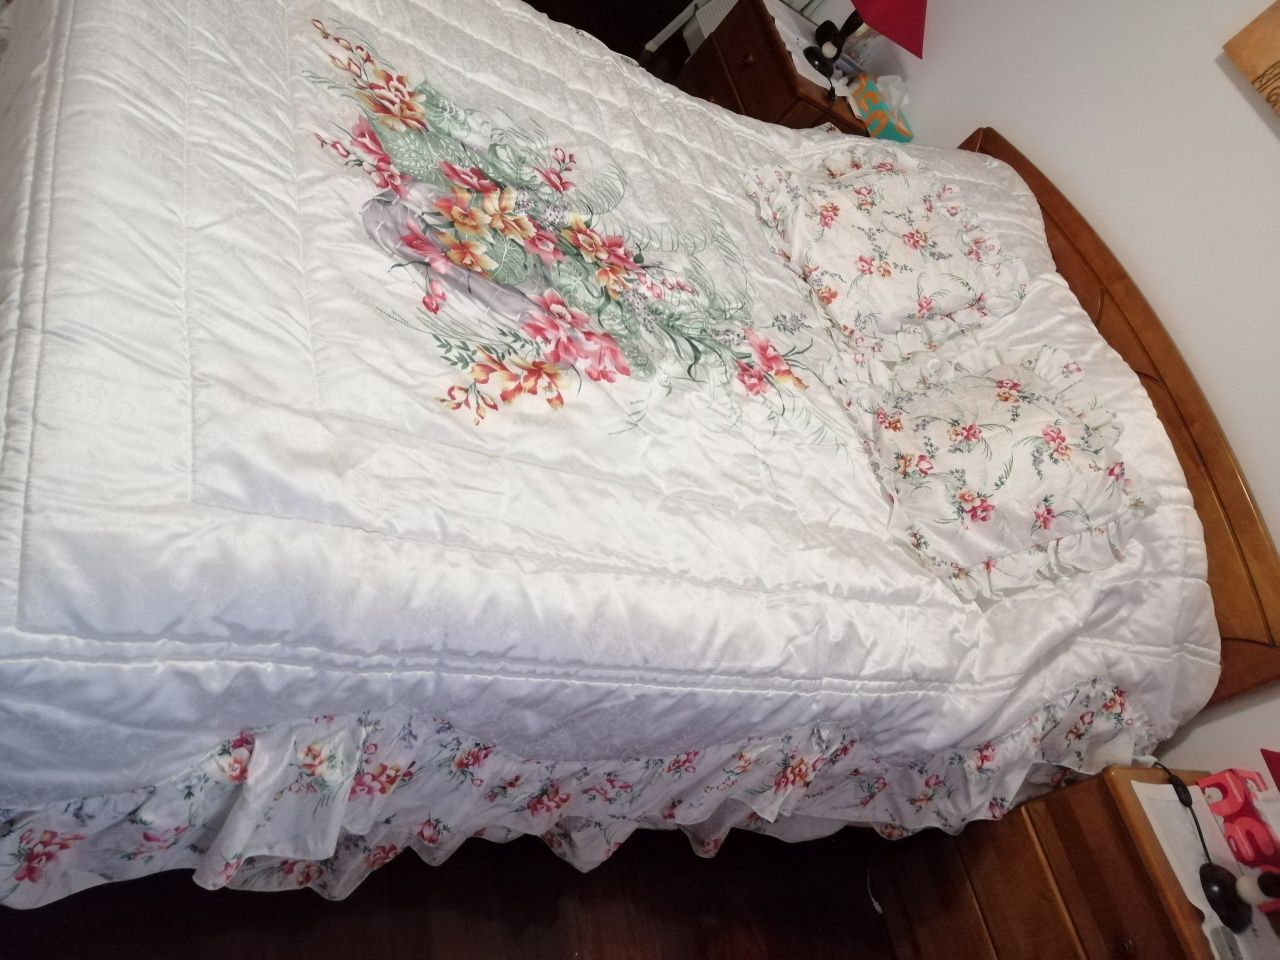 Colcha acetinada para cama casal